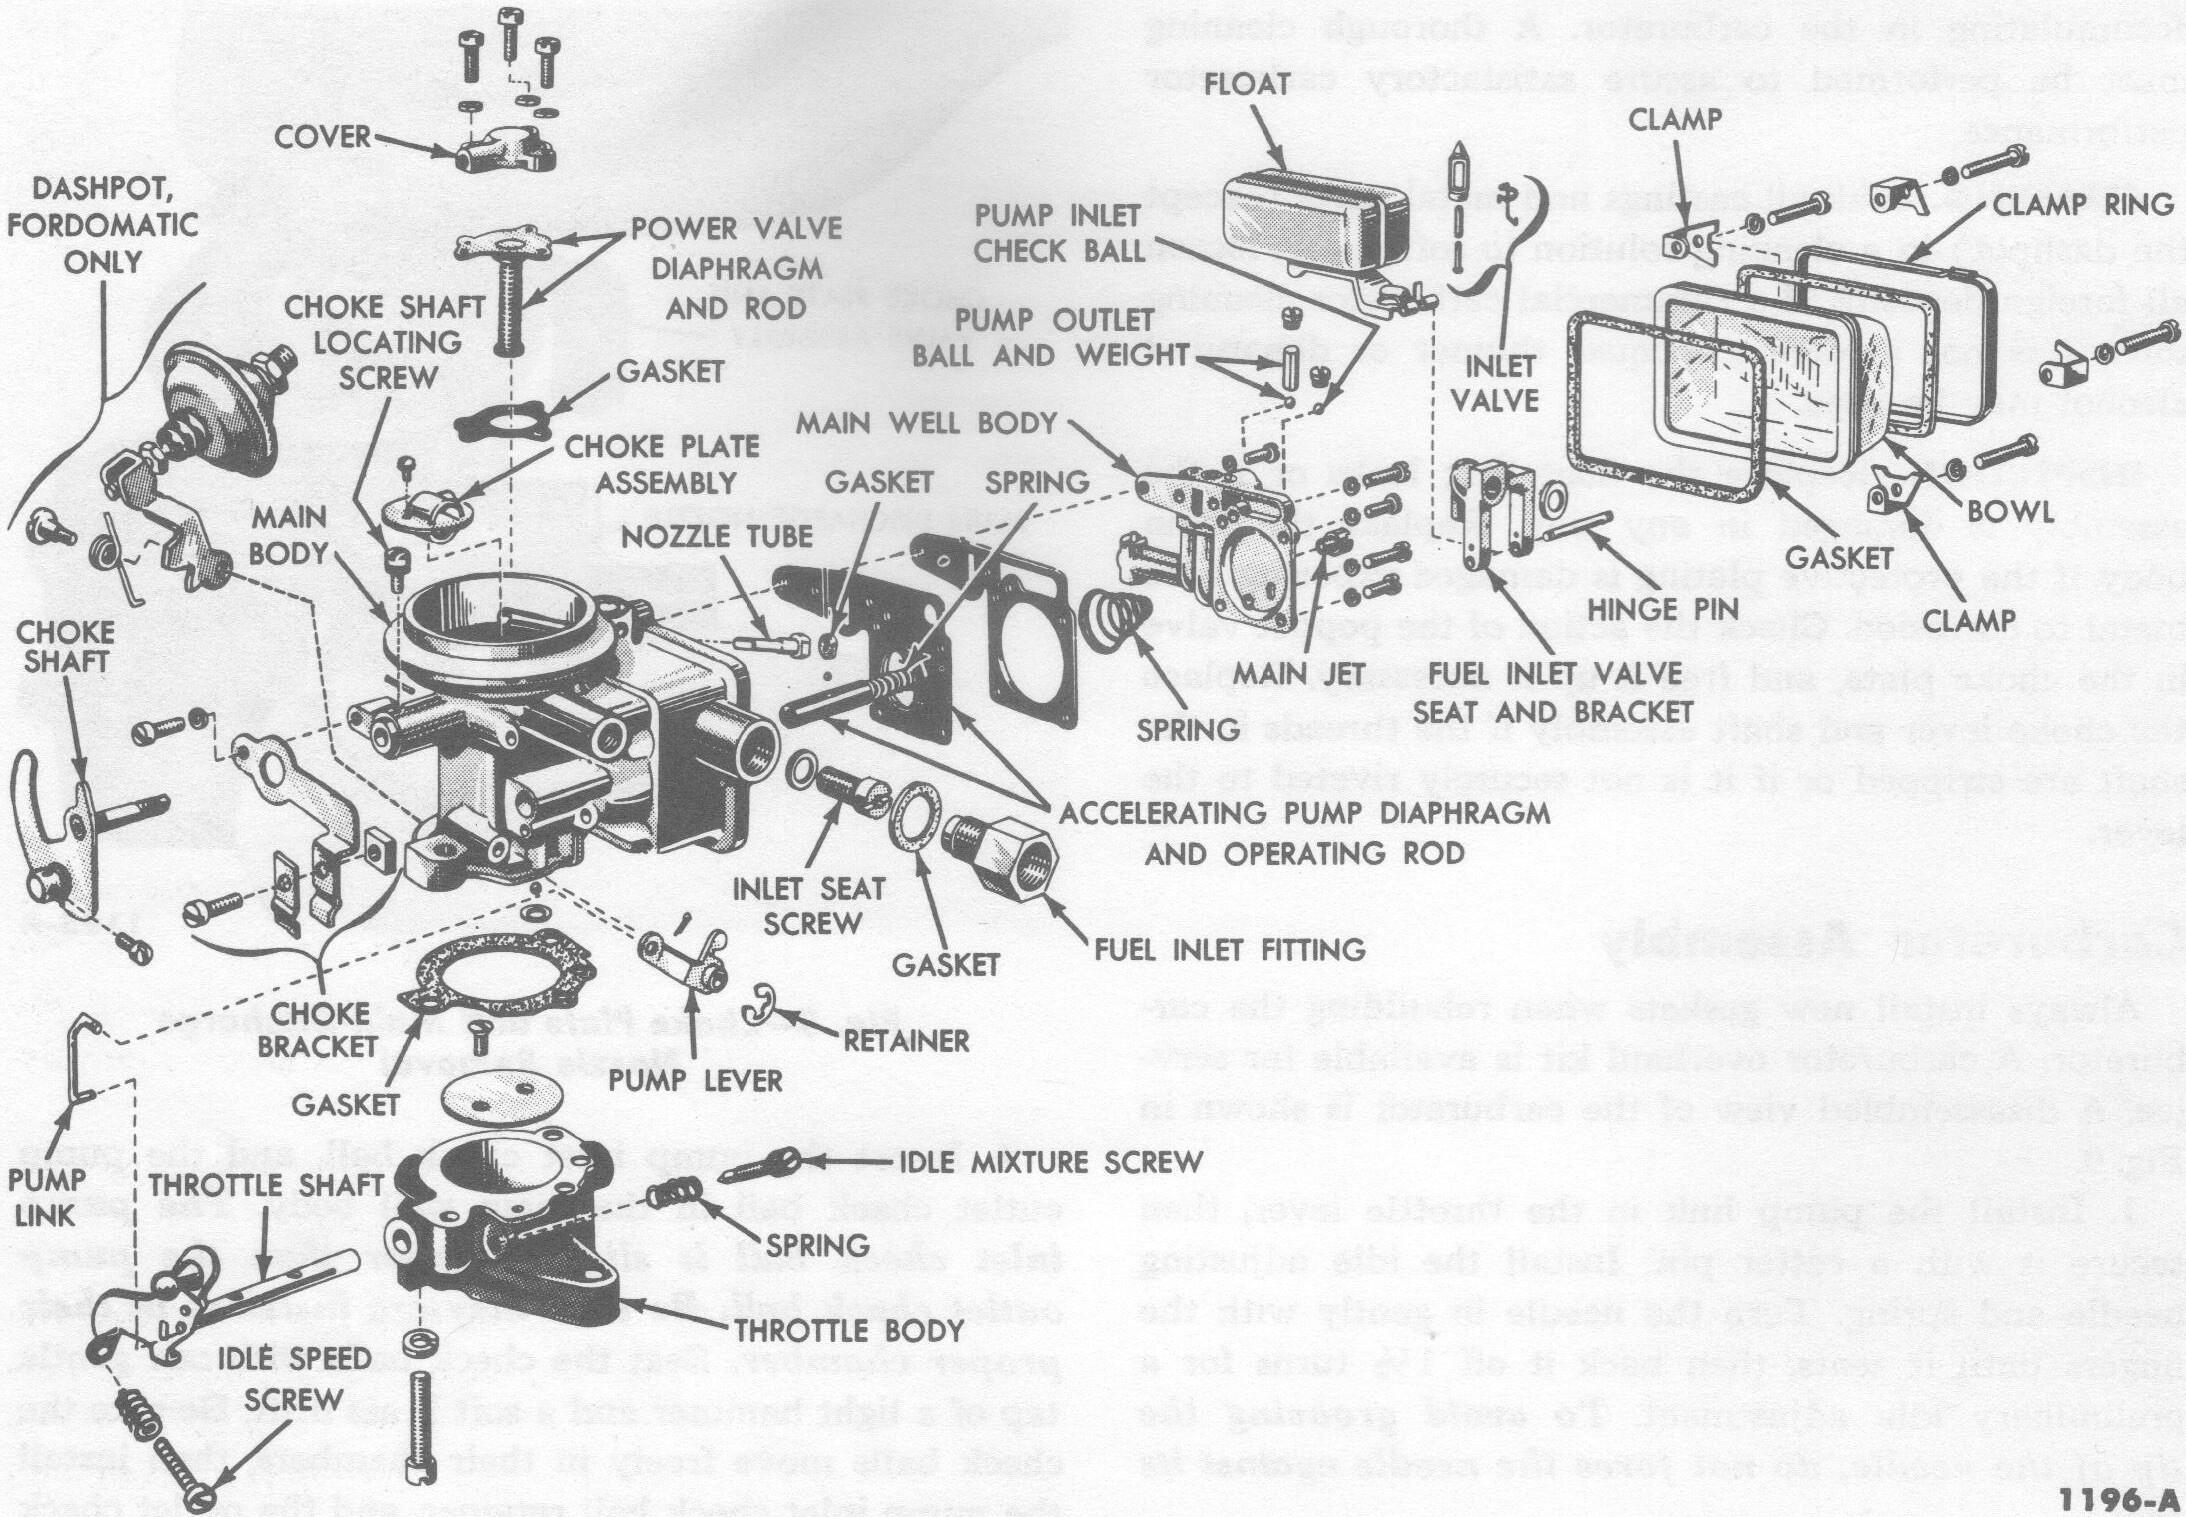 223 holley single barrel carburetor myclassicthunderbird